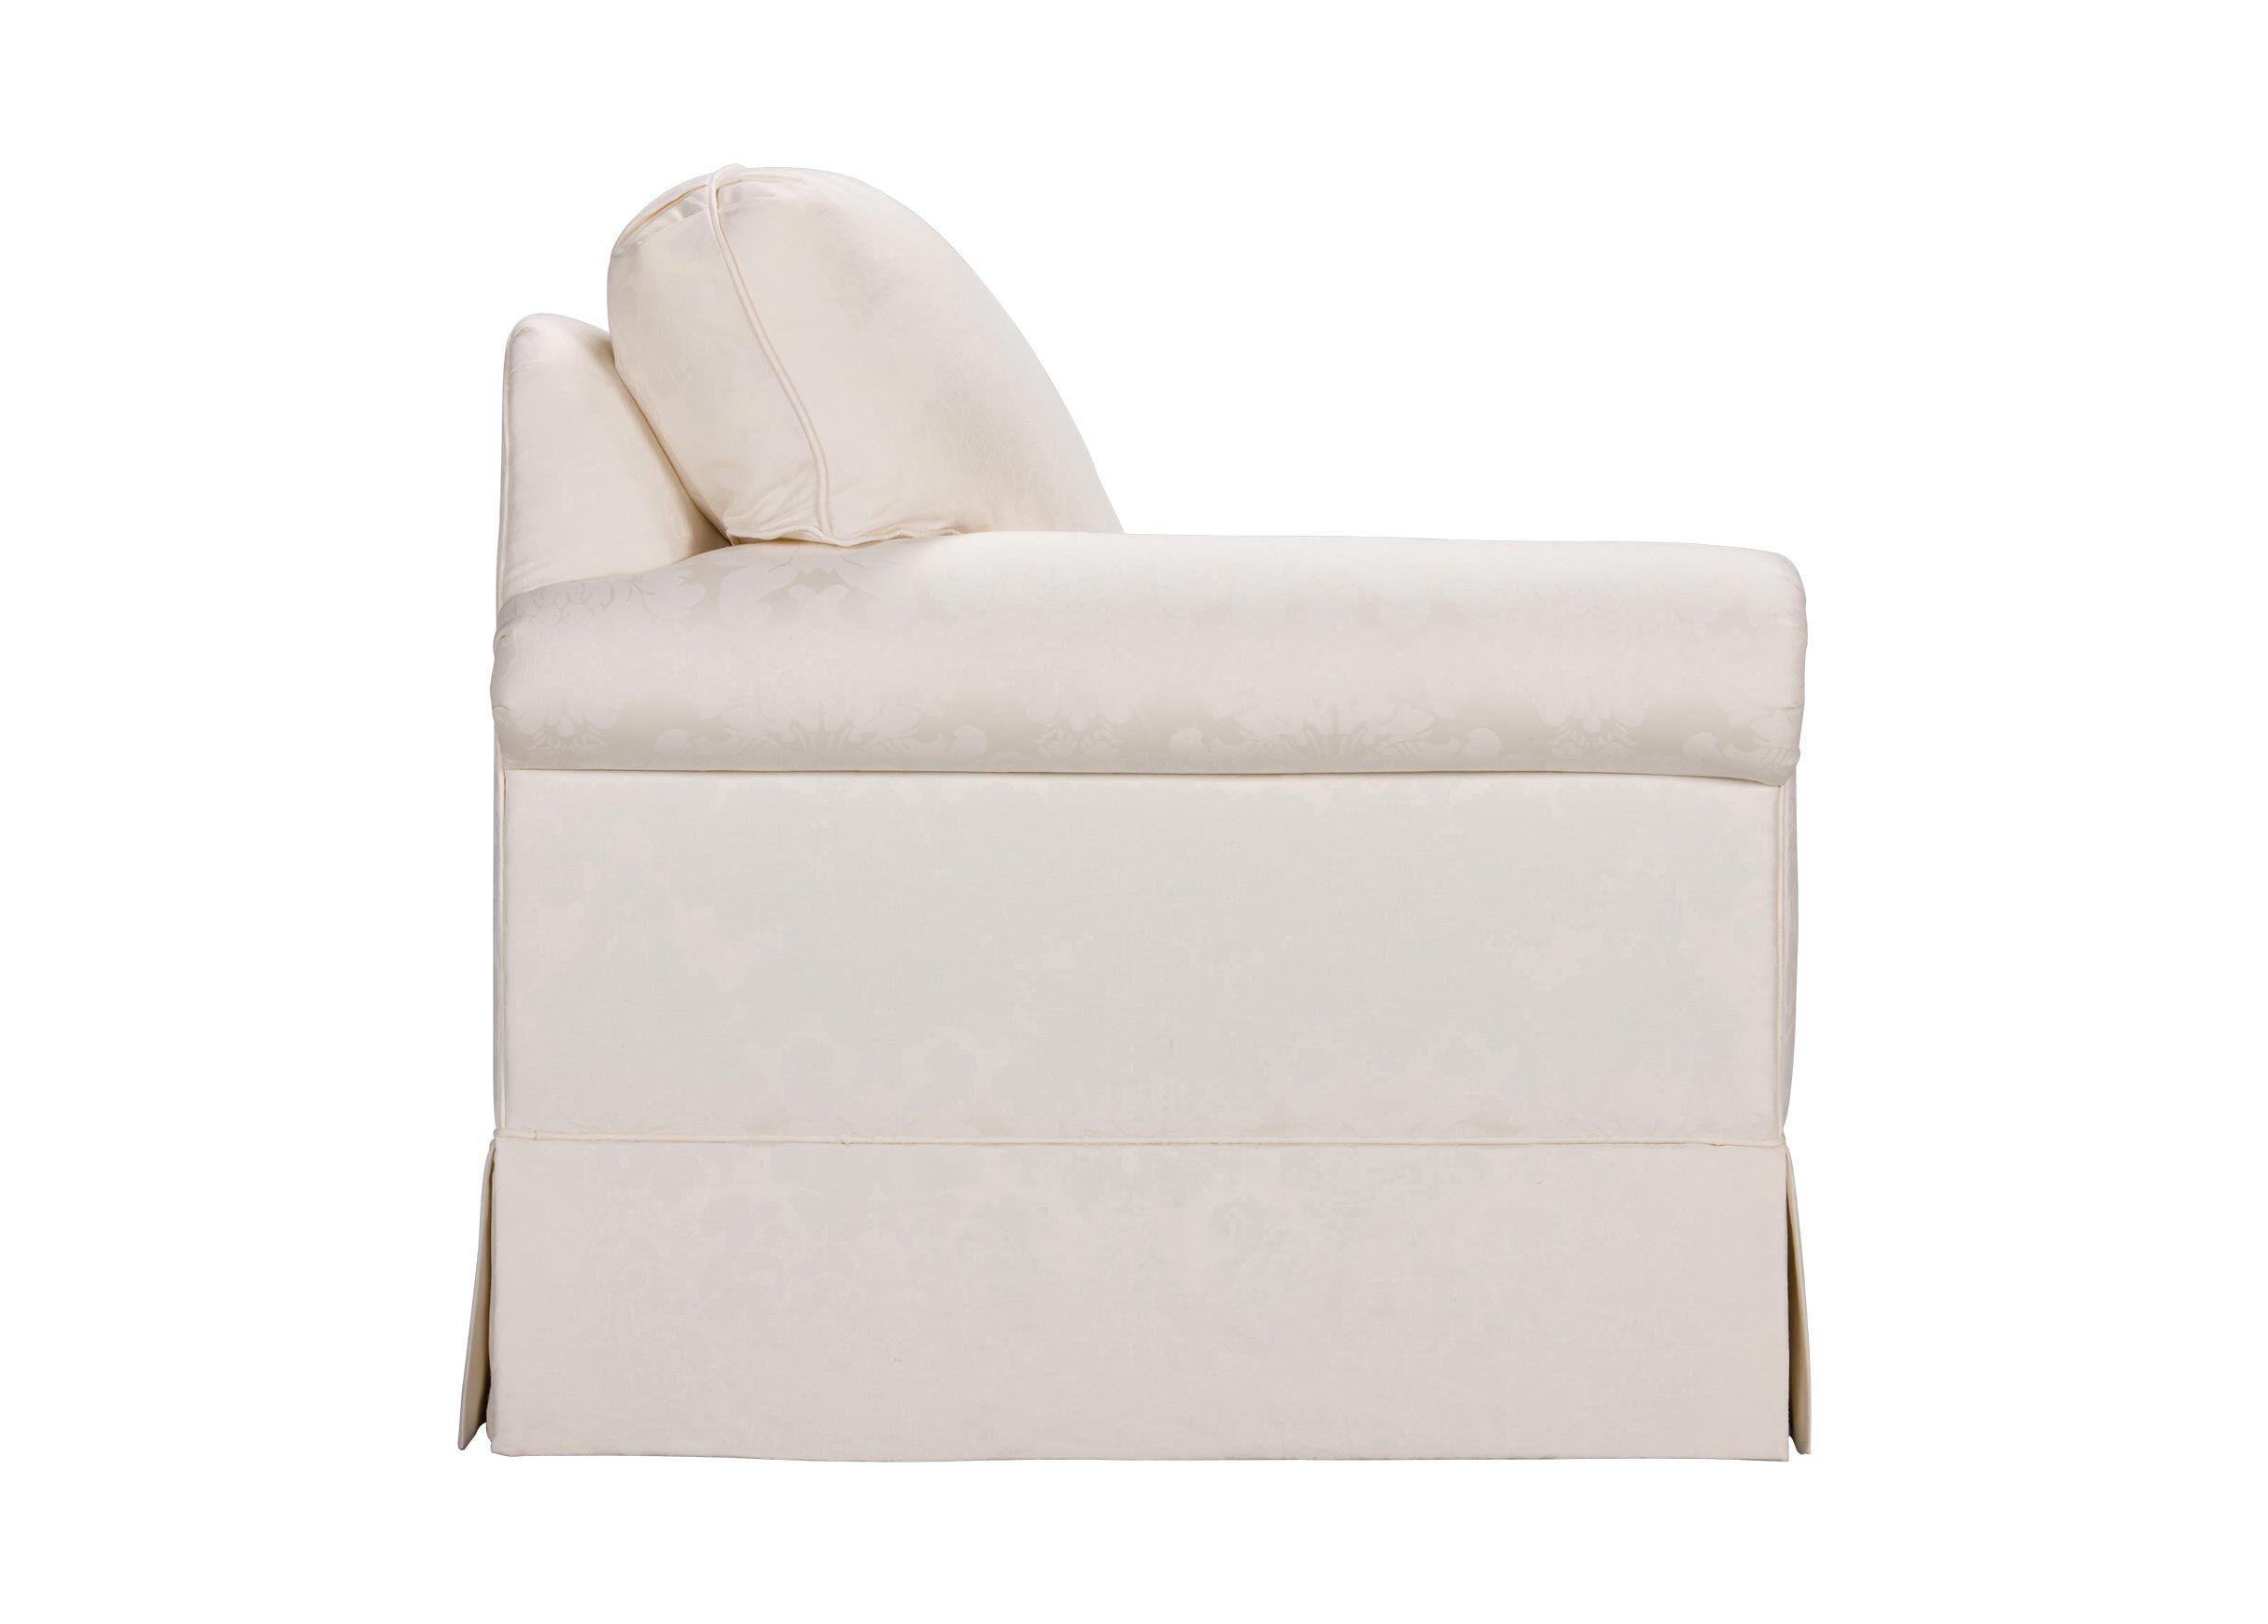 paramount sofa ethan allen french country pillows  thesofa